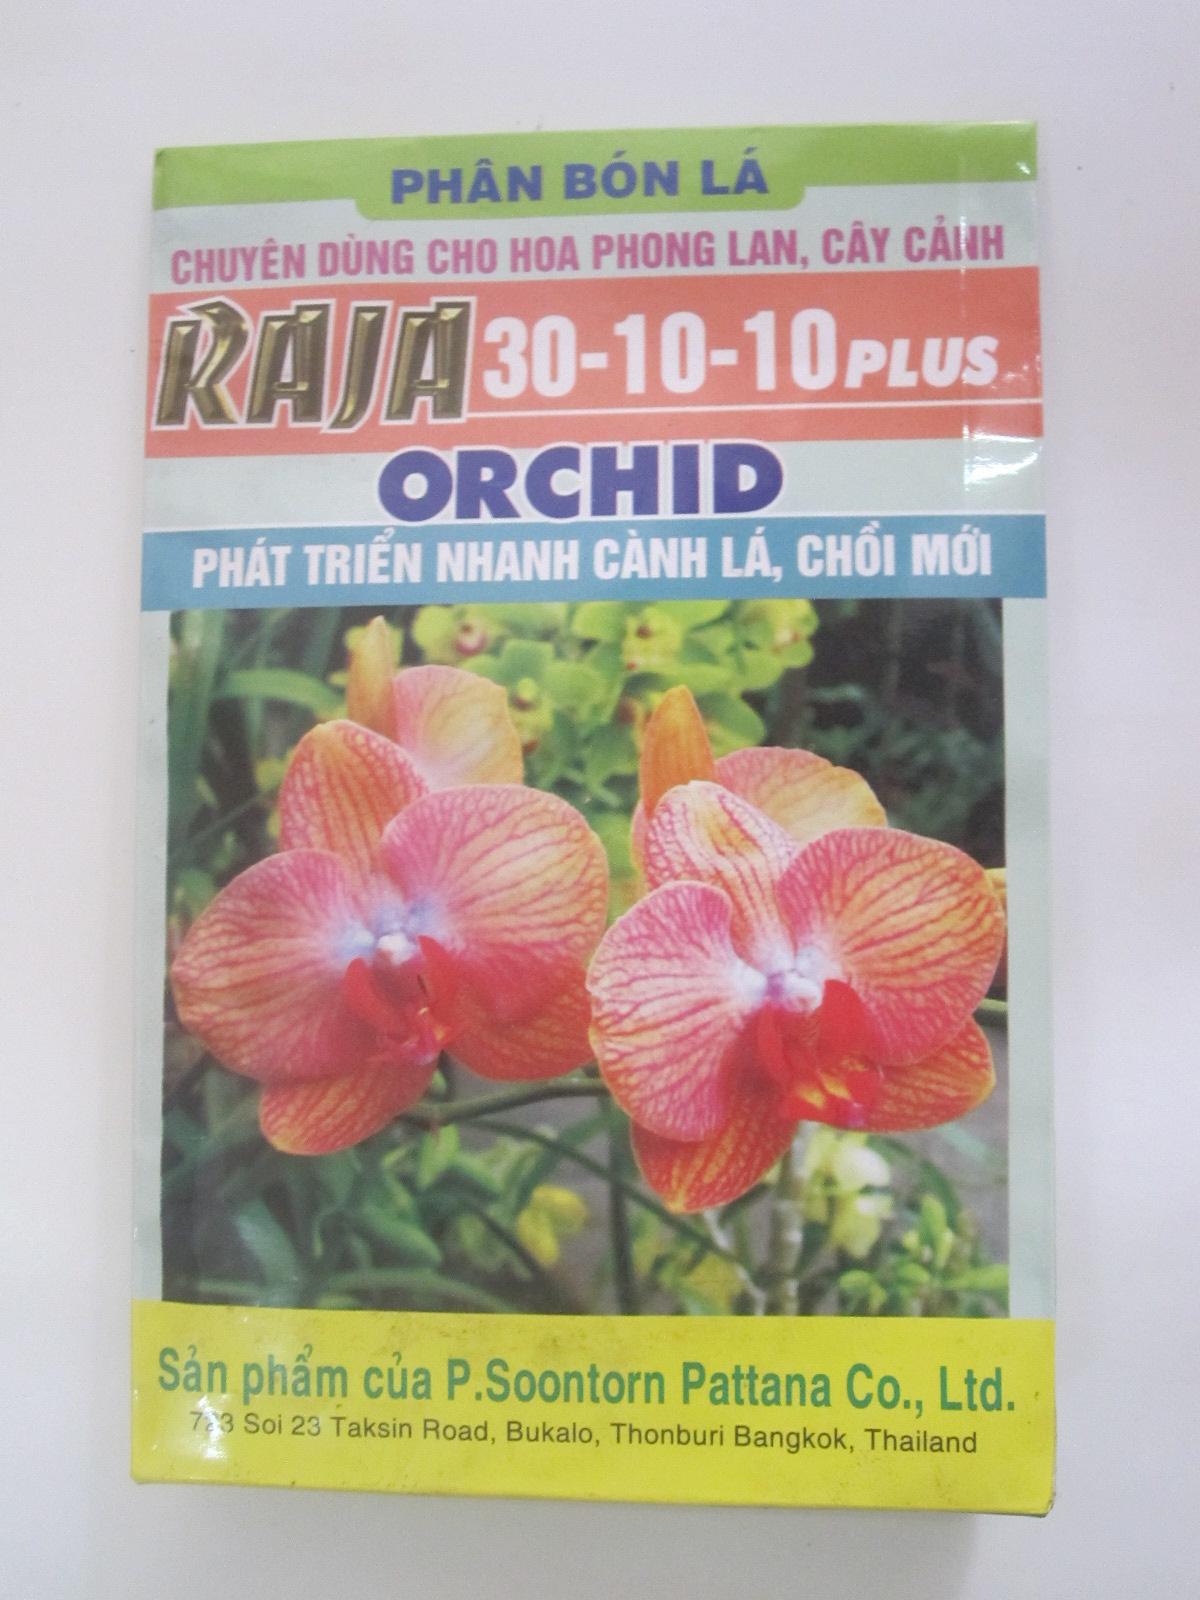 RAJA ORCHID 30-10-10